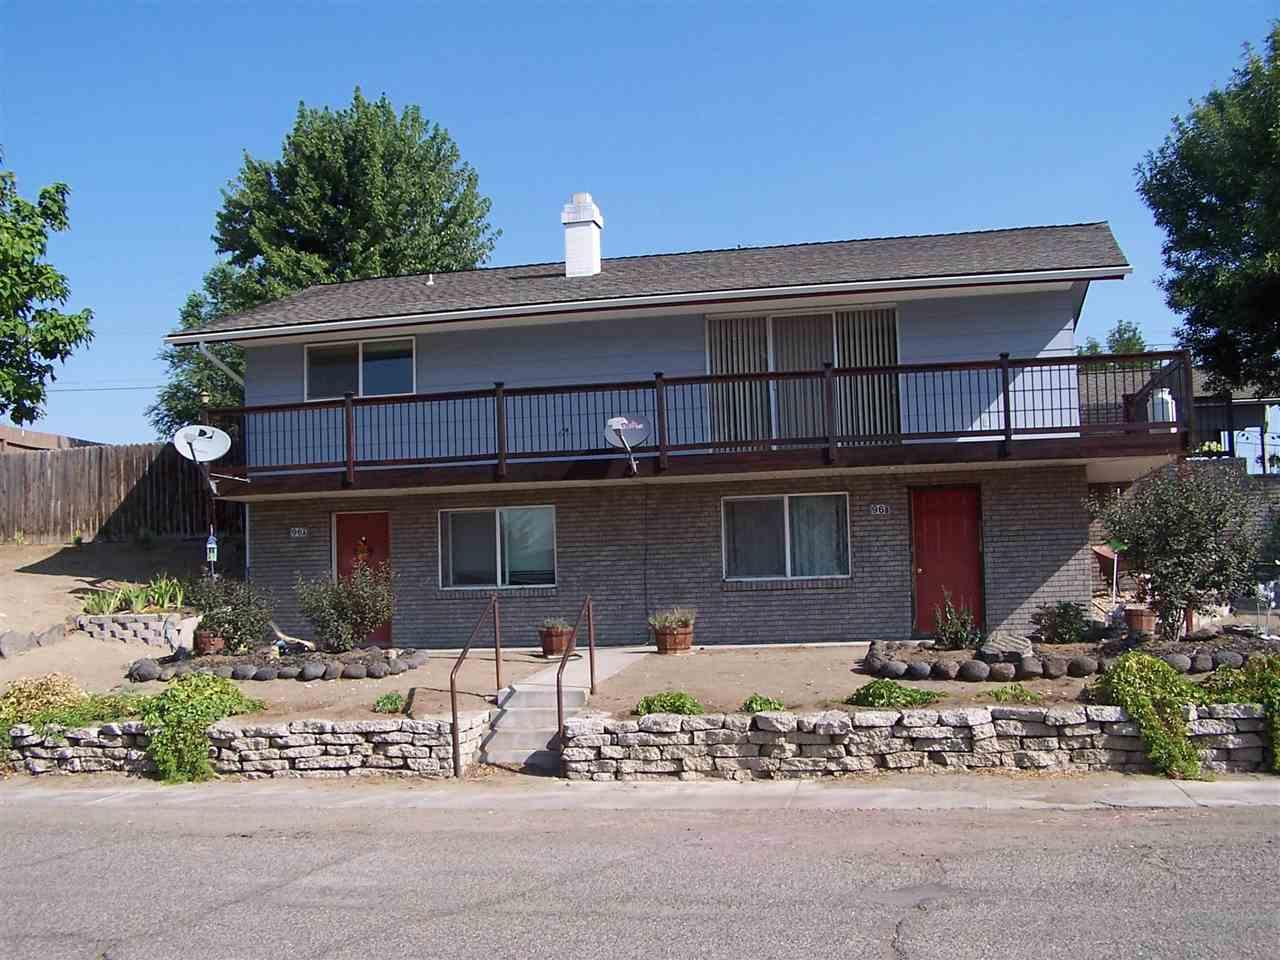 Casa Unifamiliar por un Venta en 405 N Lincoln 405 N Lincoln Glenns Ferry, Idaho 83623